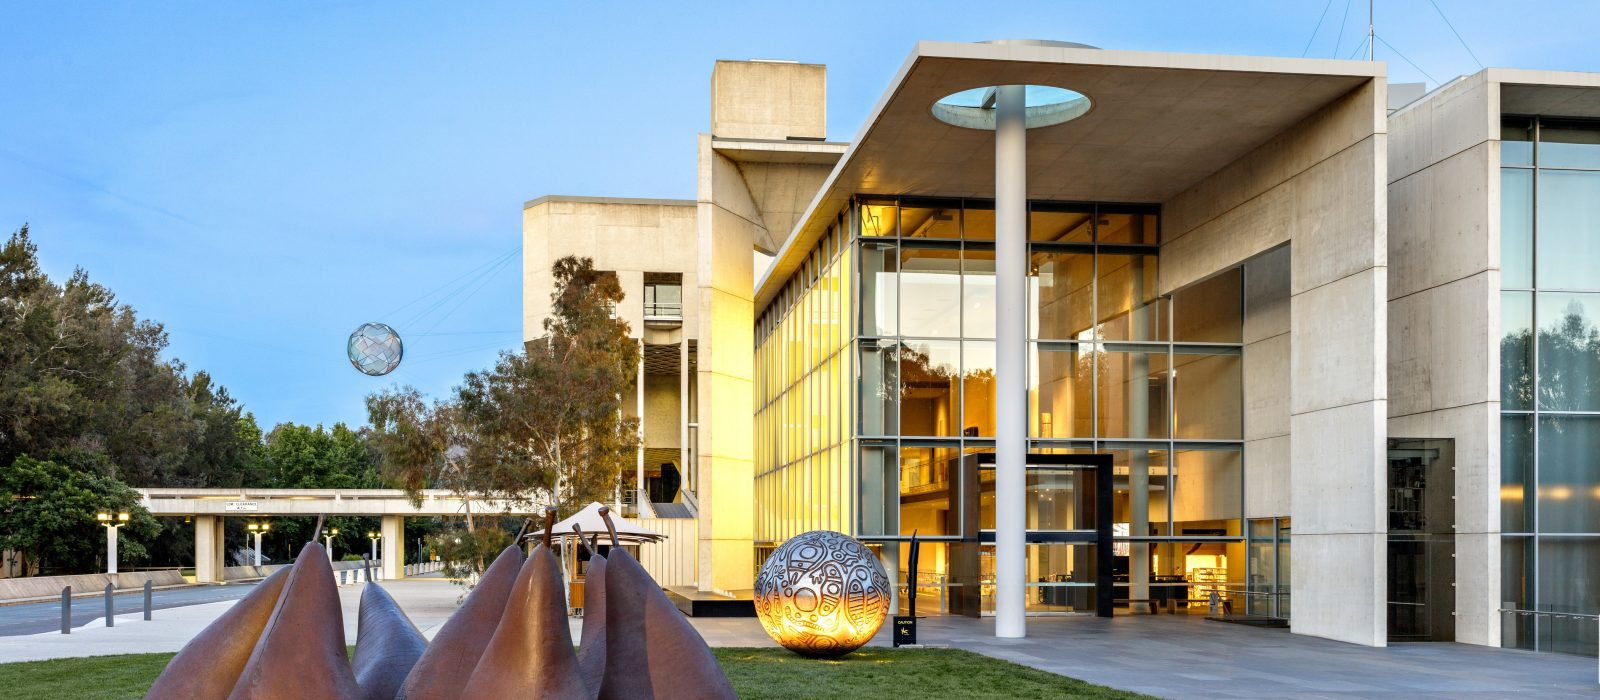 National-Gallery-of-Australia-front-entrance-1-1600x700-c-center.jpg